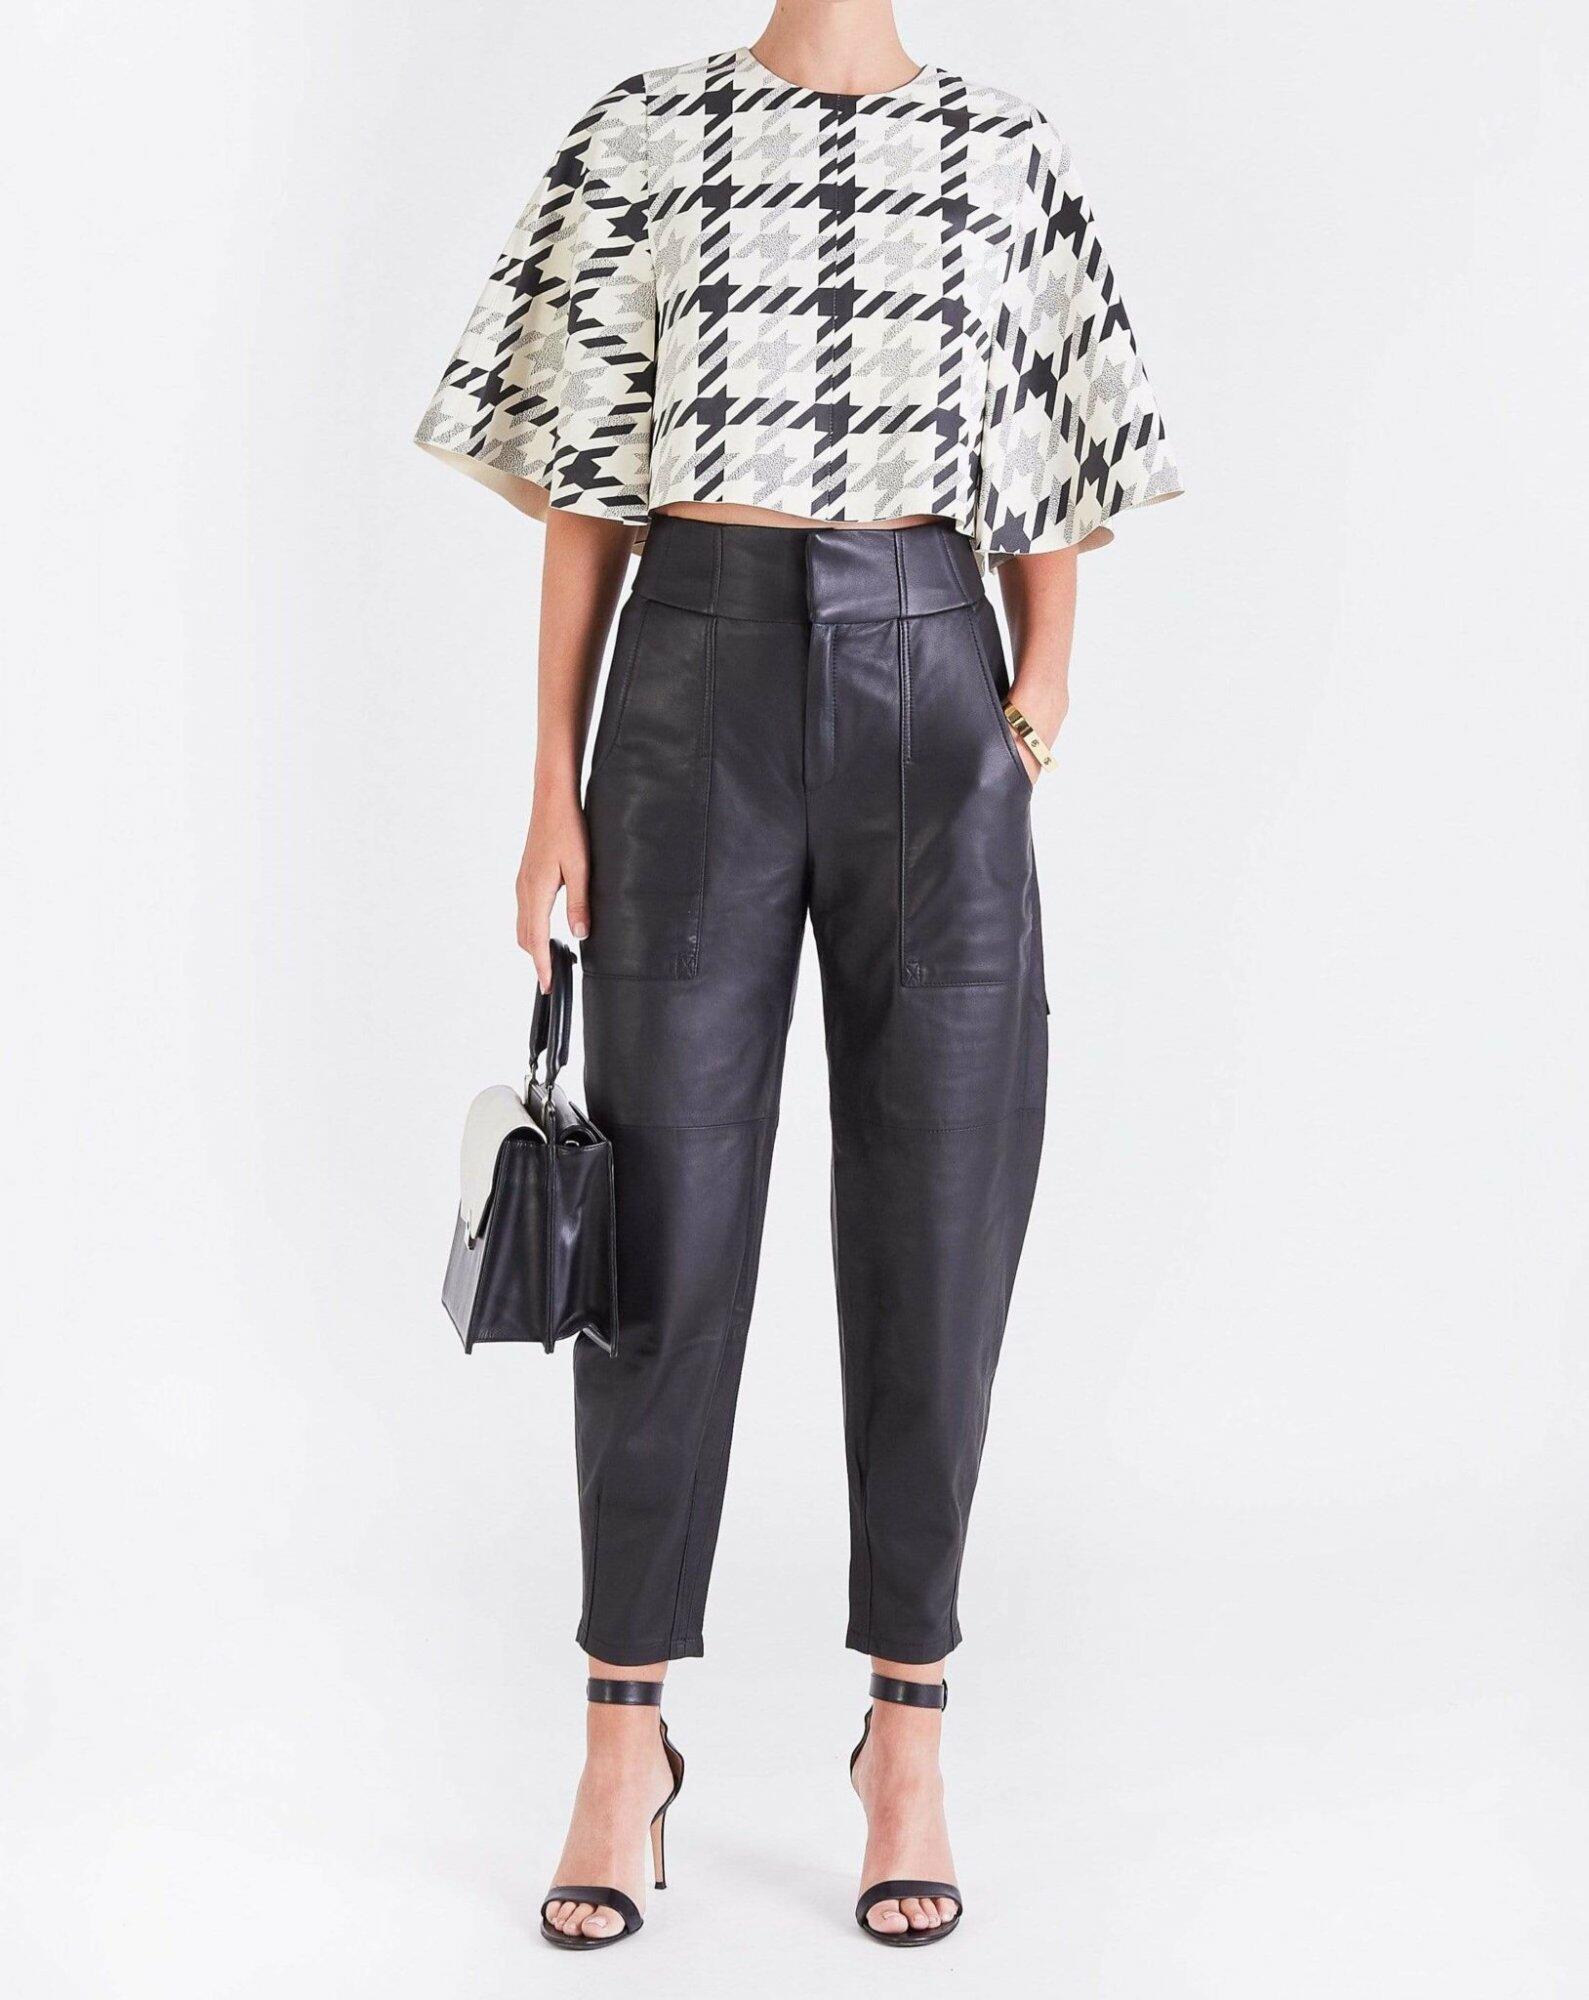 Tatjana Leather Trousers